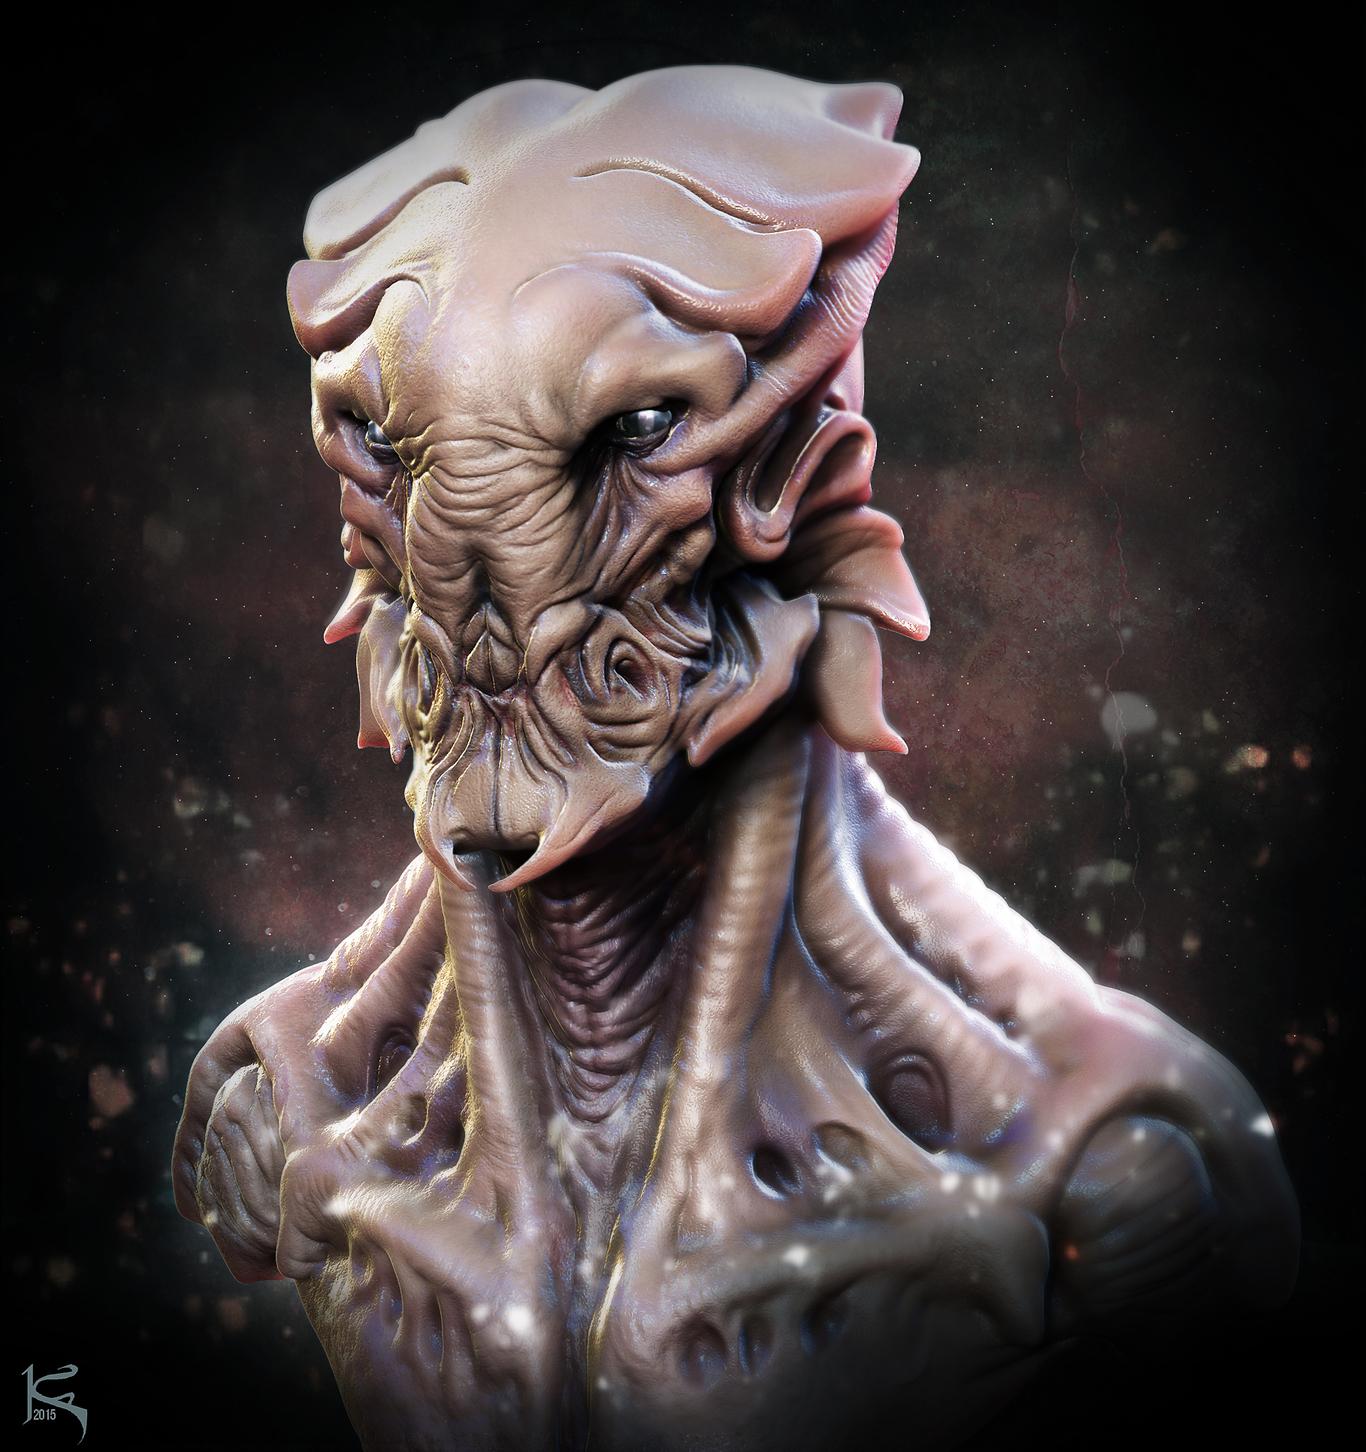 Aris Kolokontes Fan Art #3 - Alien Creature Design Doodle